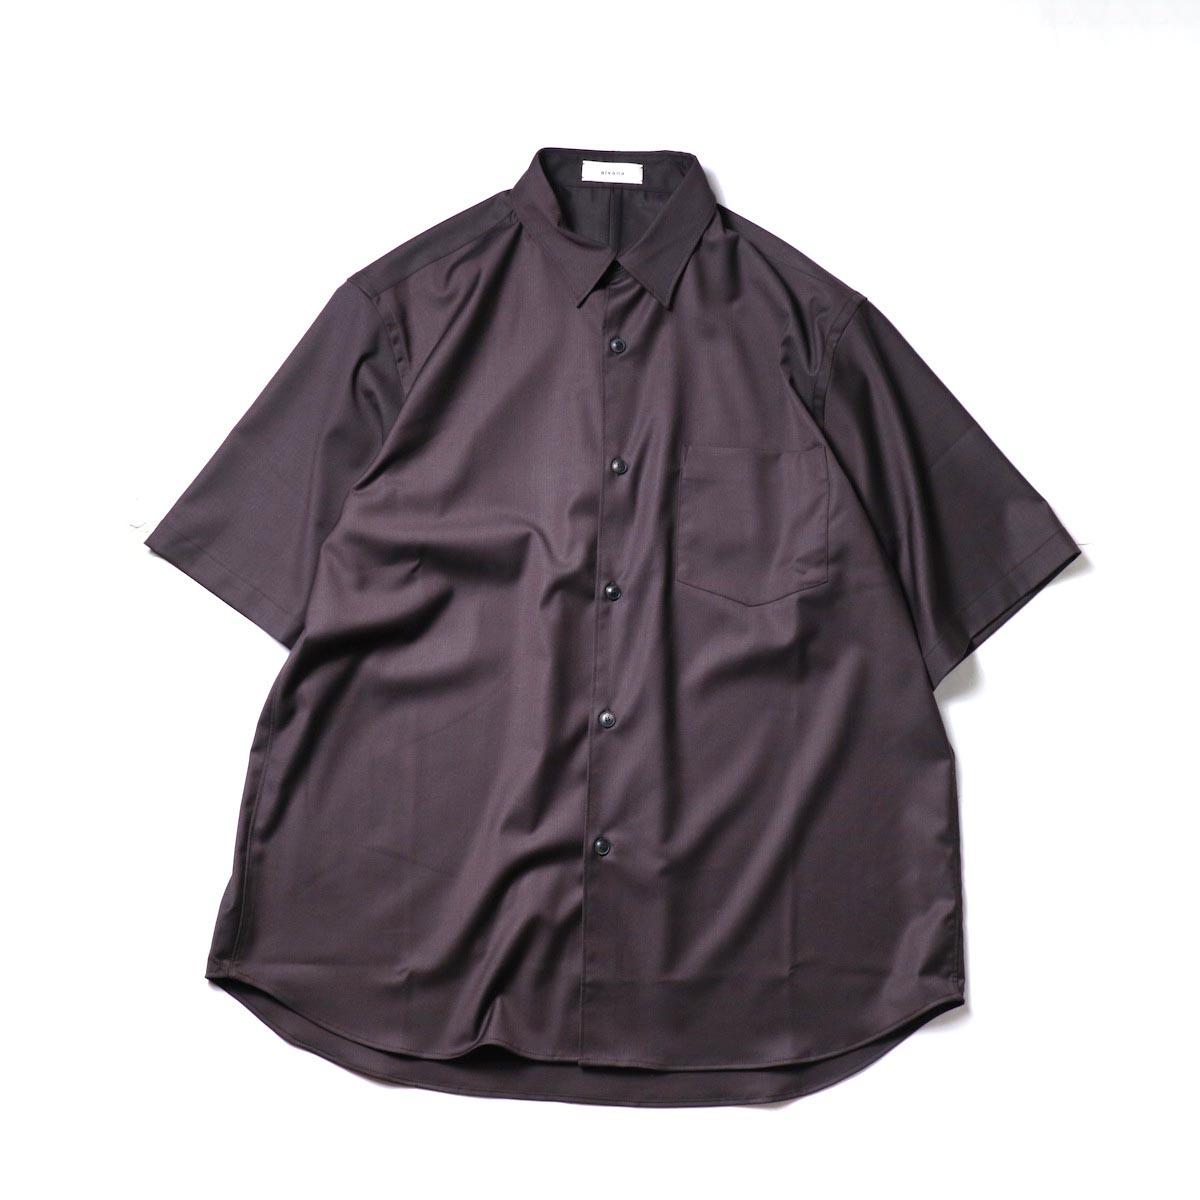 alvana / Wrinkle Proof Shirts (Charcoal)正面